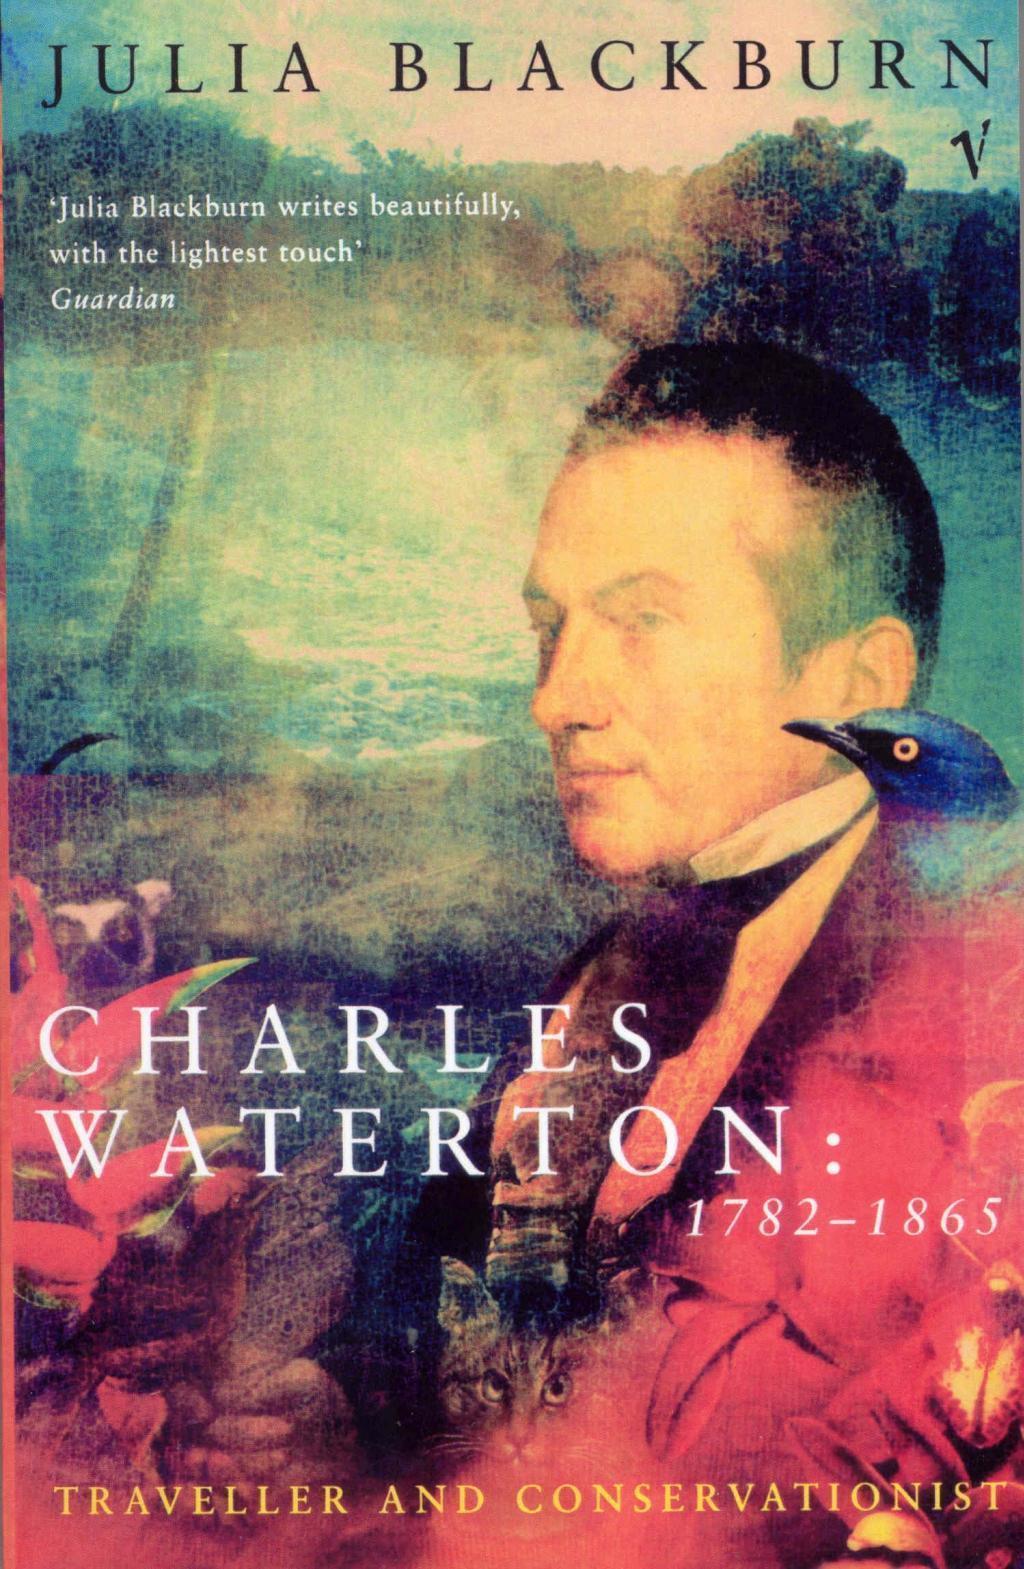 Charles Waterton 1782-1865